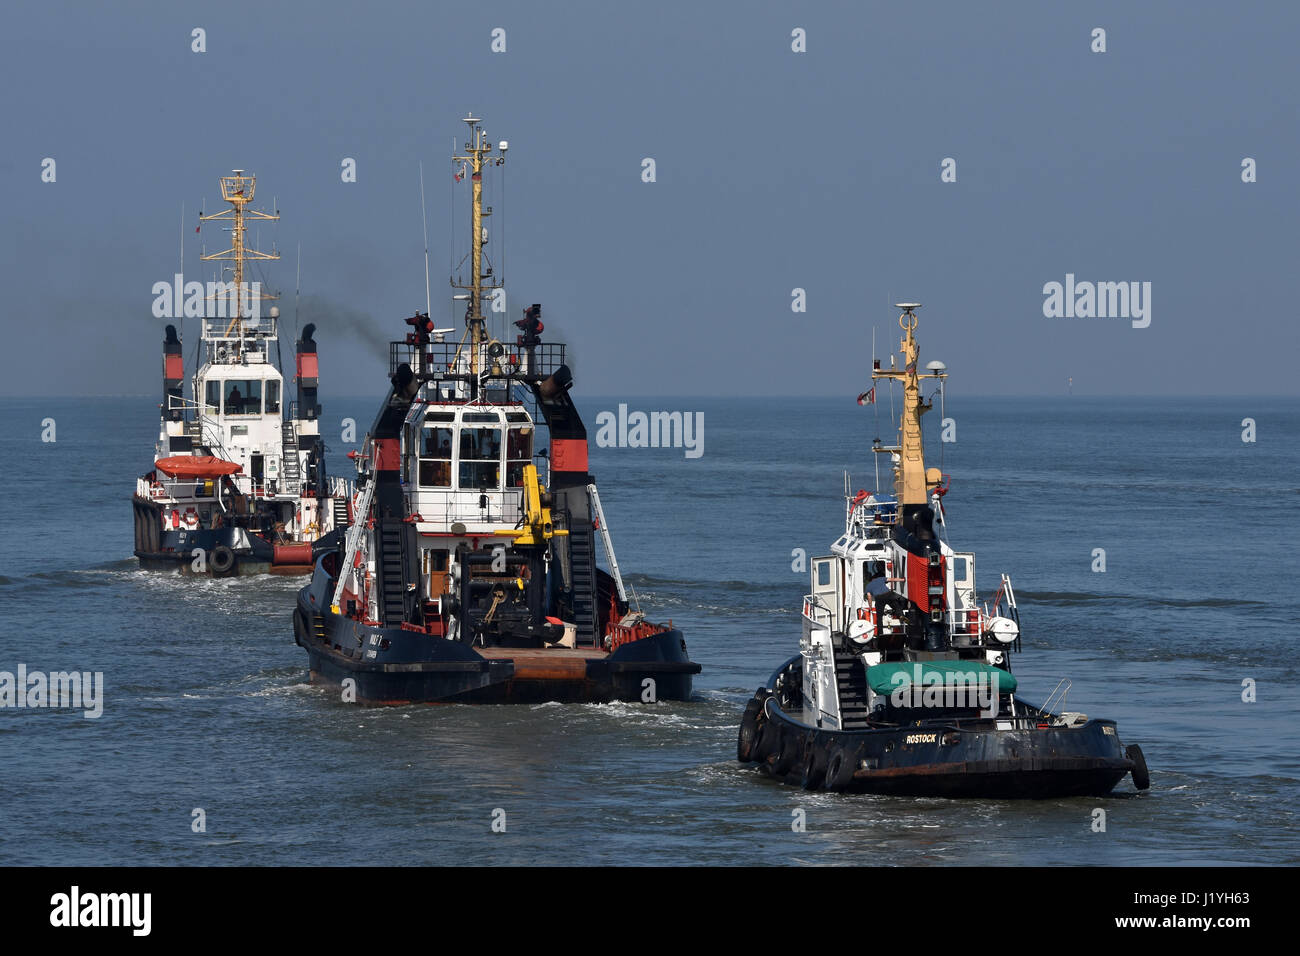 Wulf tugboats heading for sea - Stock Image